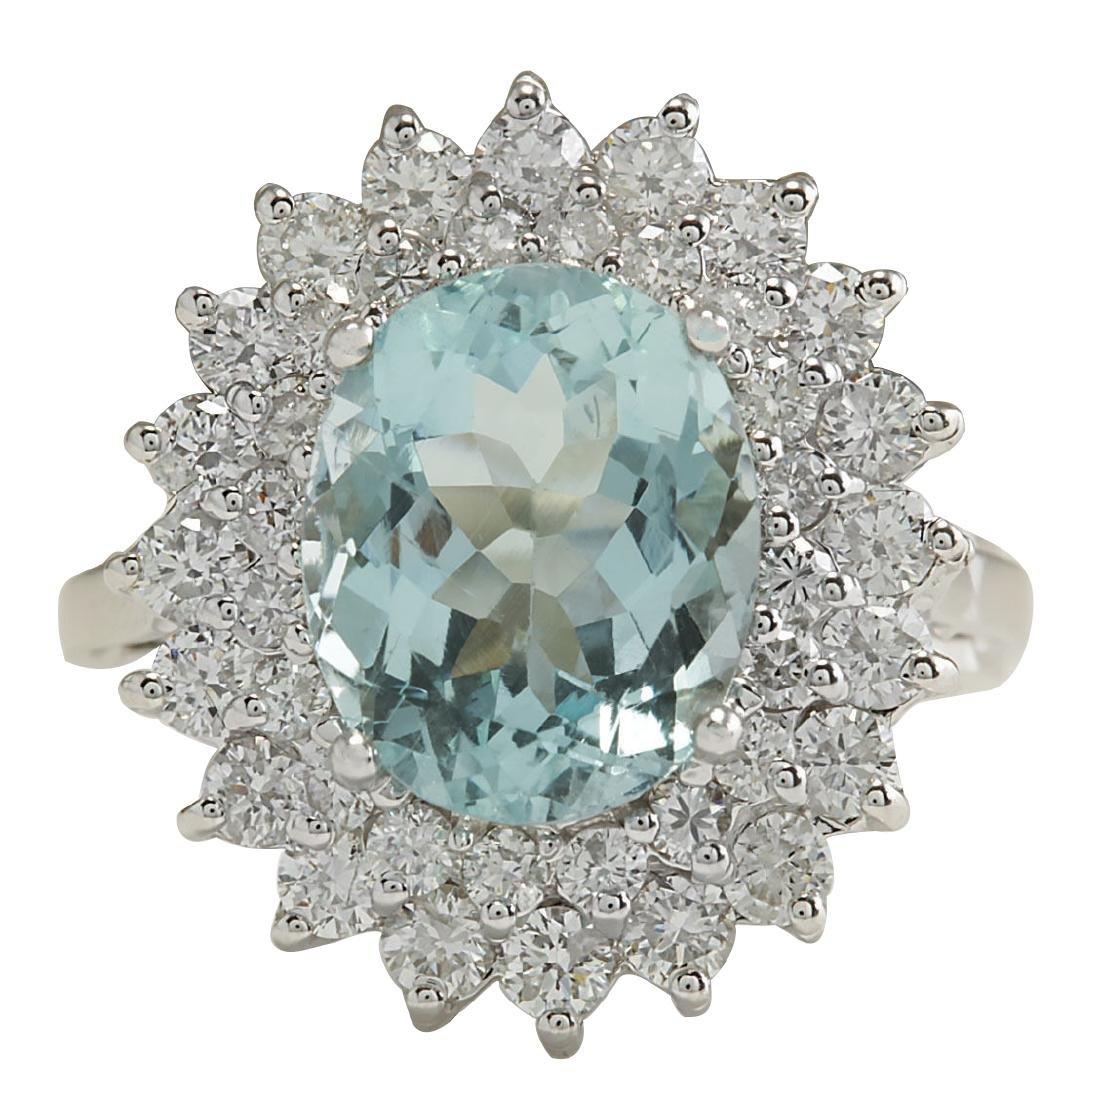 7.03CTW Natural Aquamarine And Diamond Ring In 18K